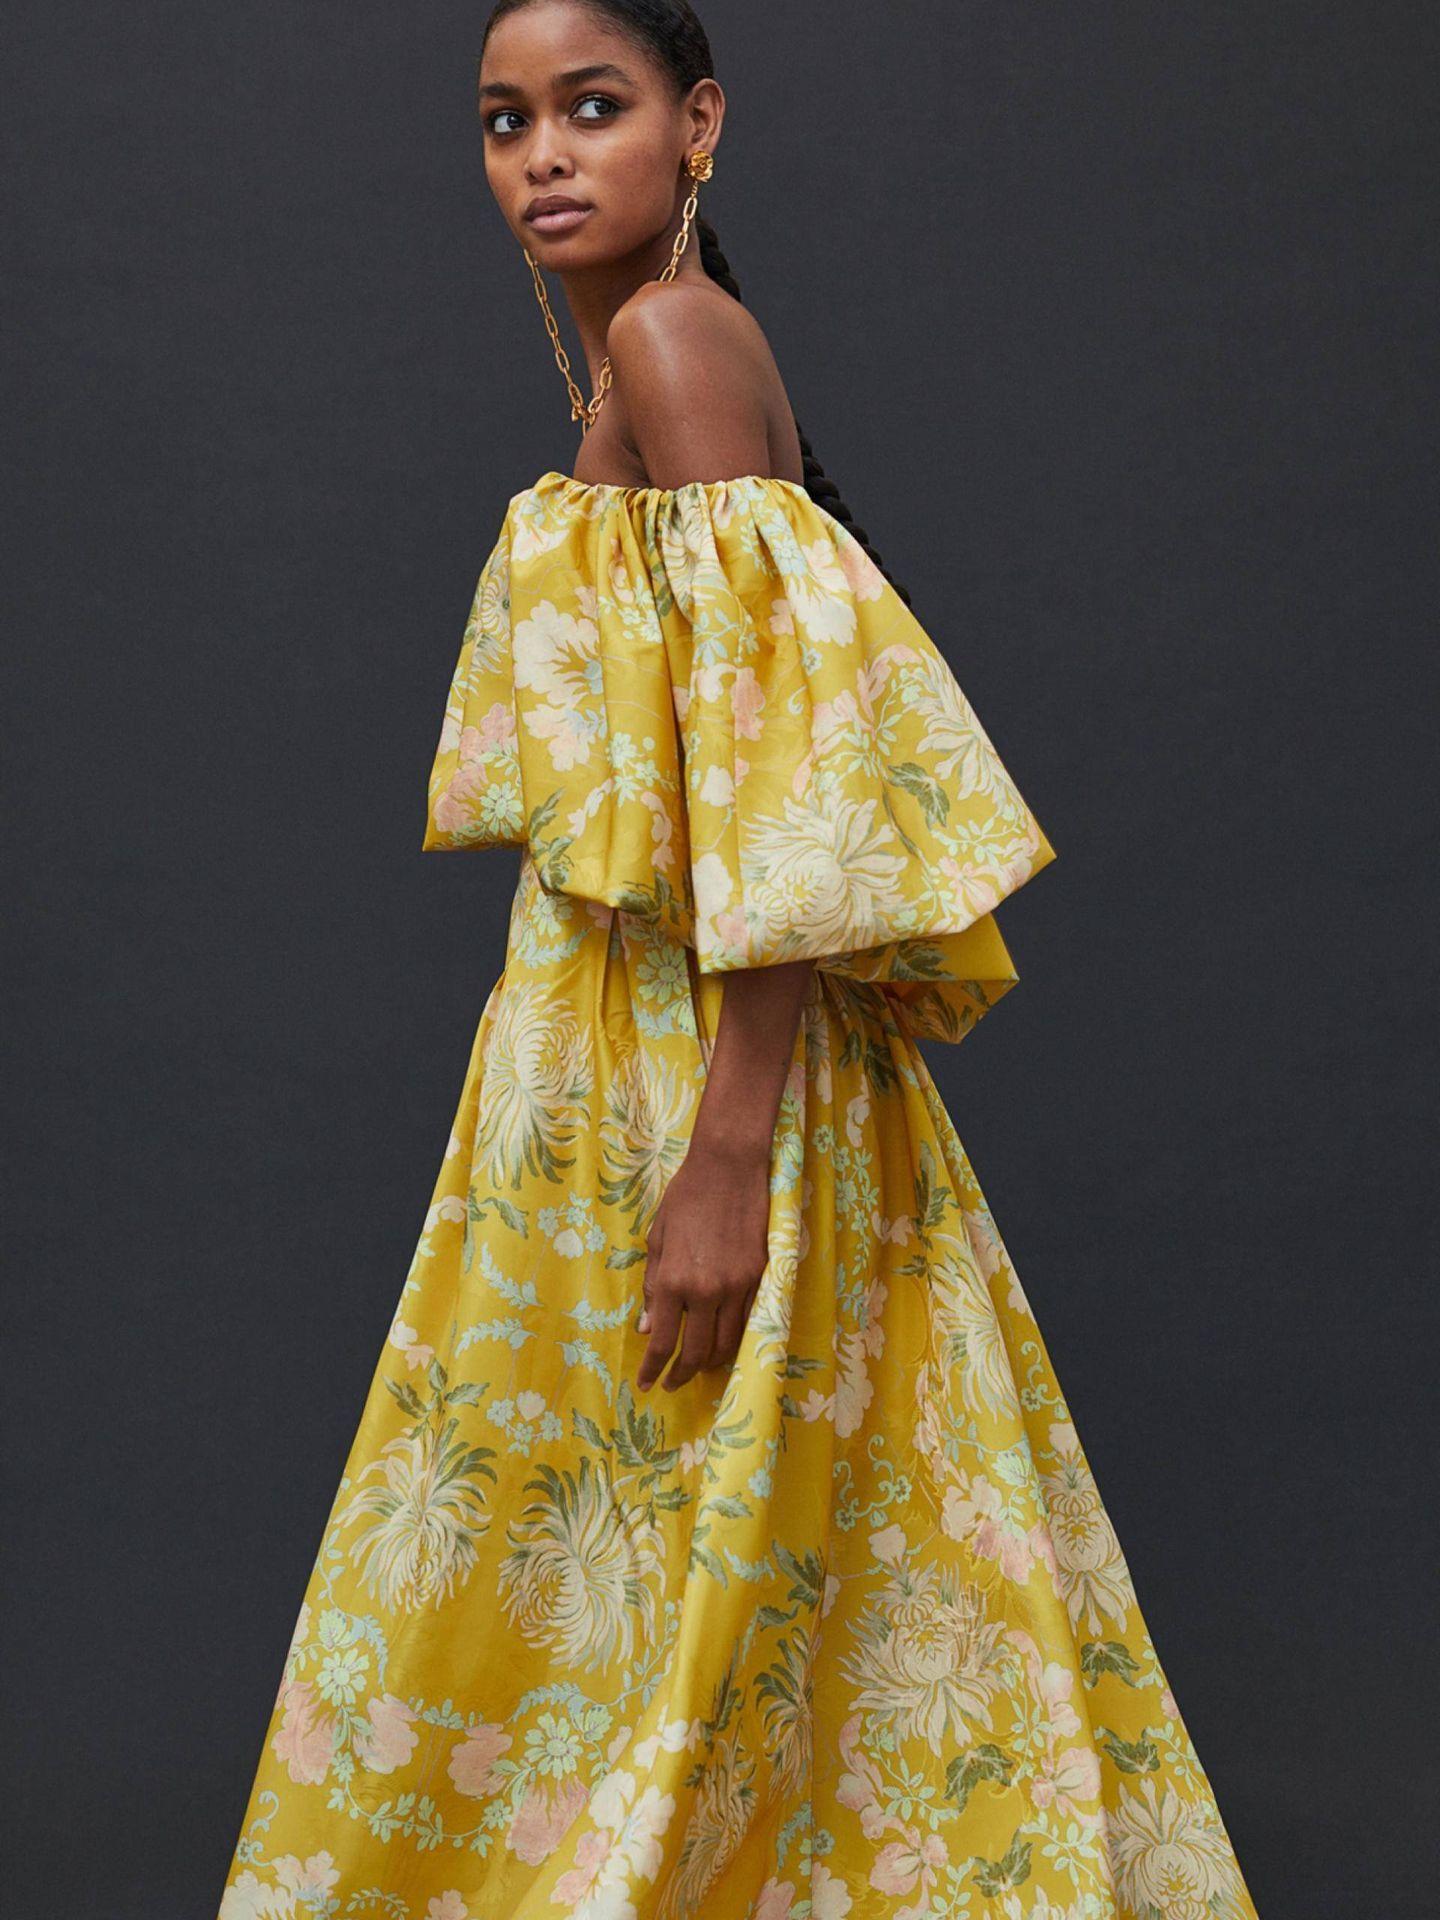 Vestidos Concious Collection de HyM. (Cortesía)